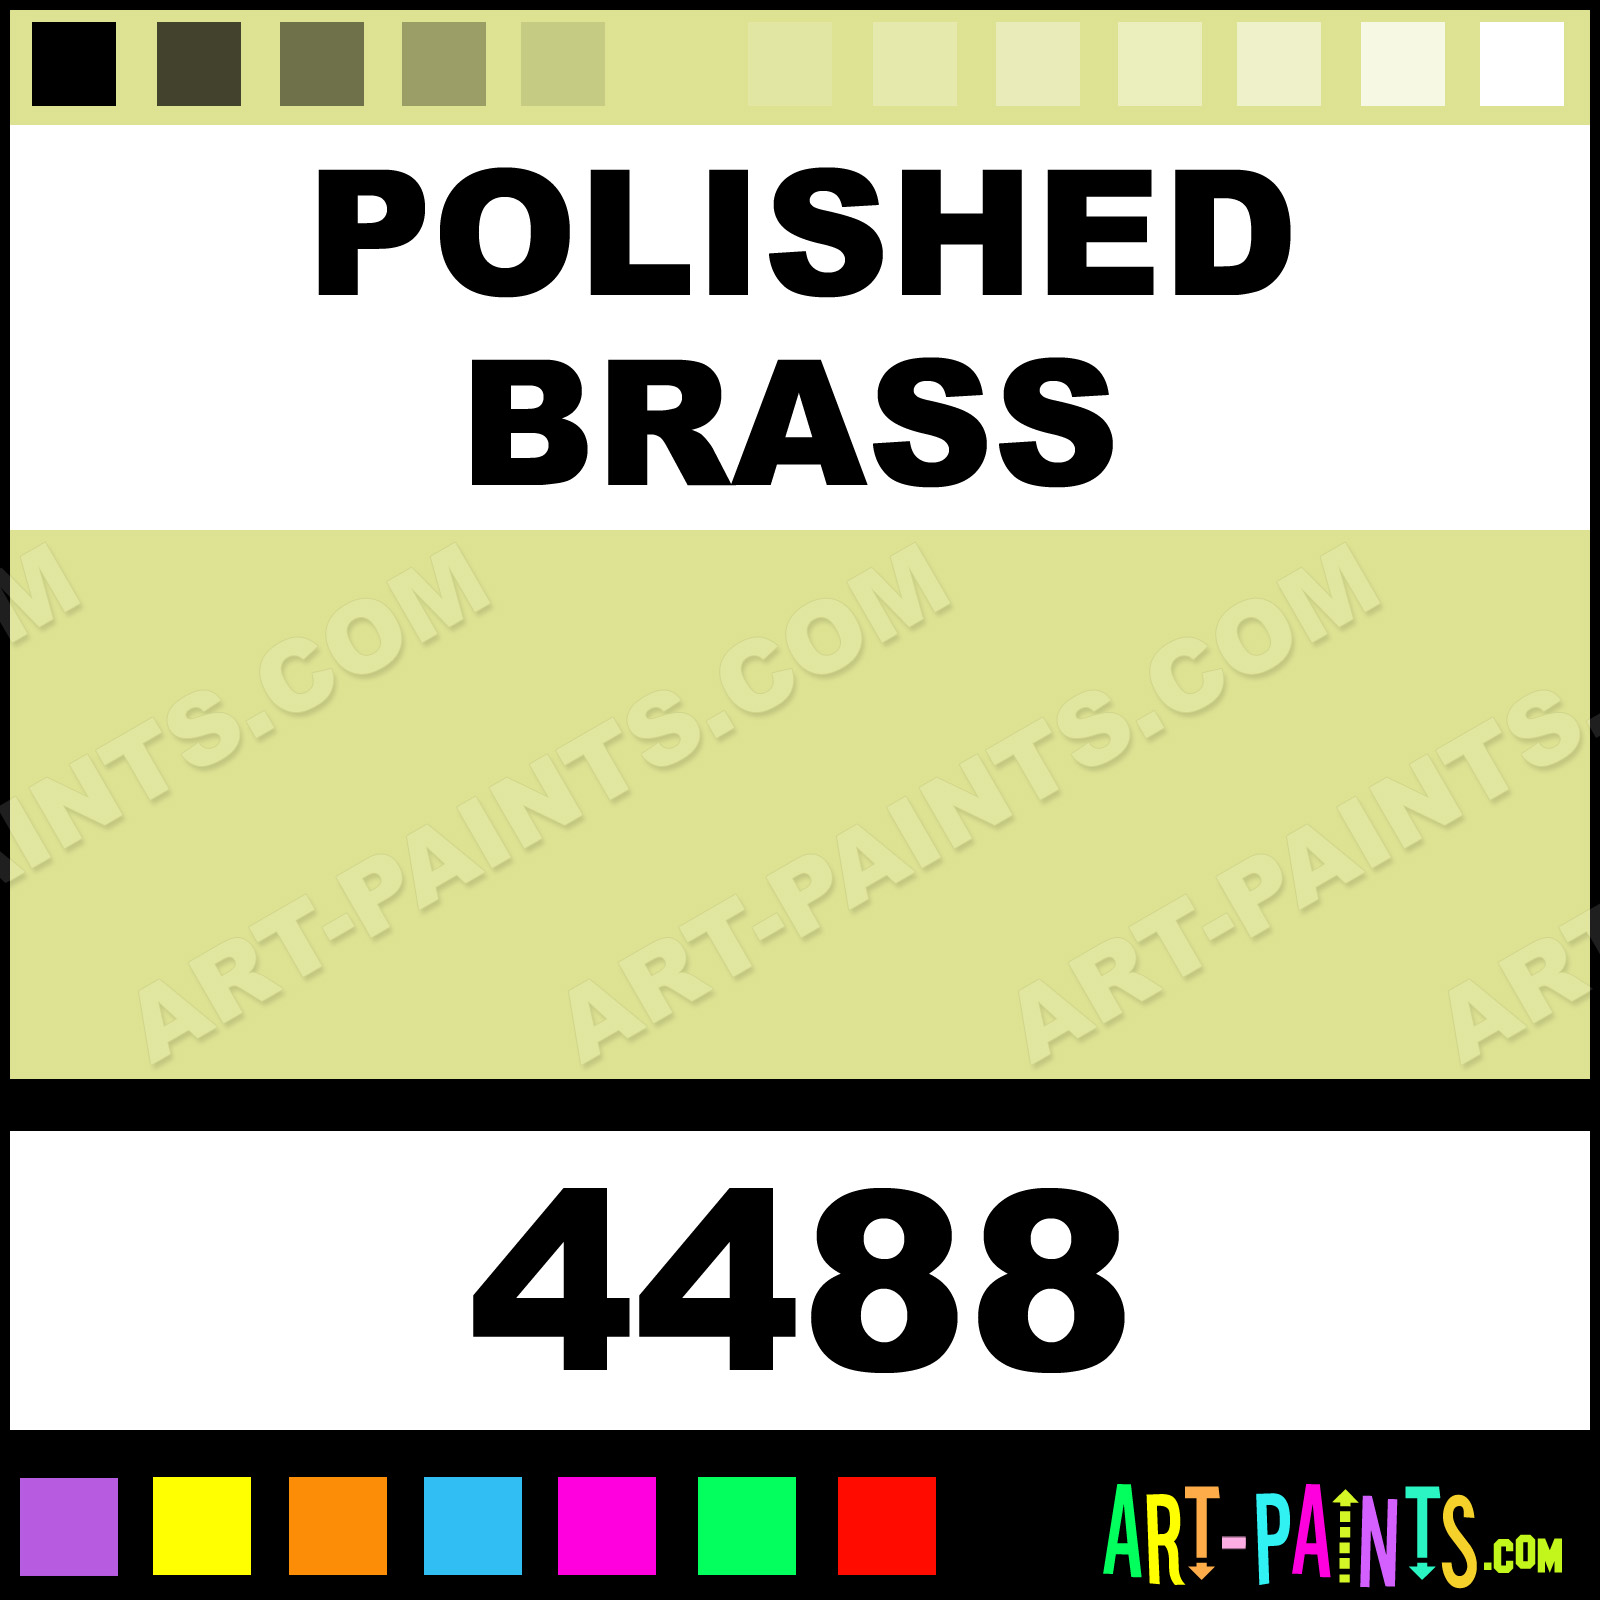 polished brass metallic spray enamel paints 4488 polished brass paint polished brass color. Black Bedroom Furniture Sets. Home Design Ideas